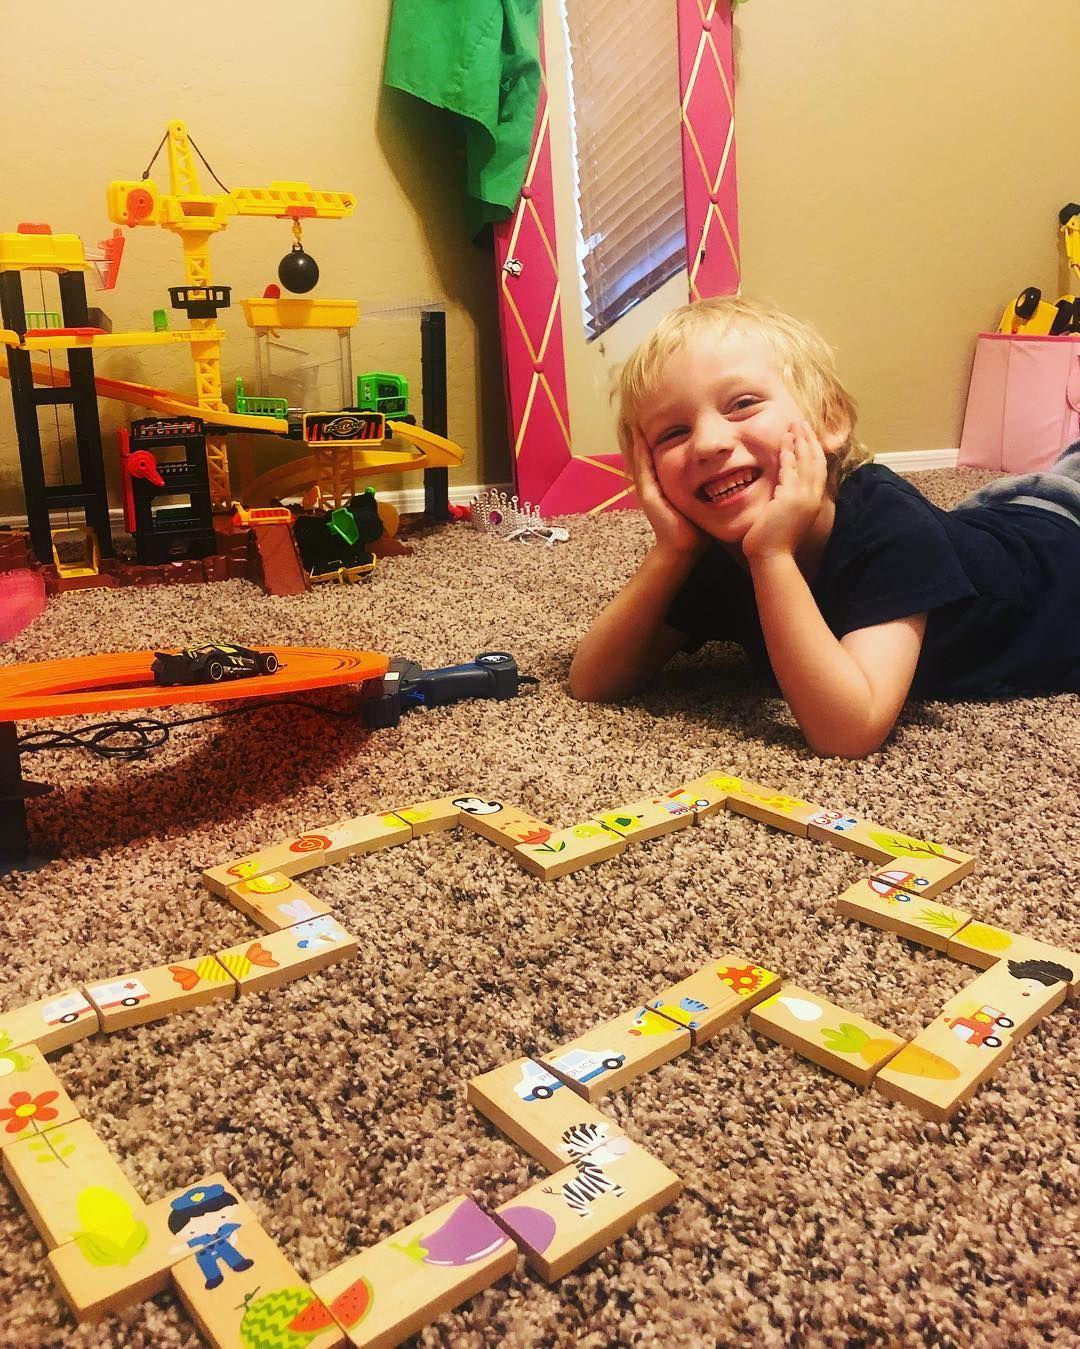 MEIGO Toddler Toys - Baby Kids Wooden Educational ...